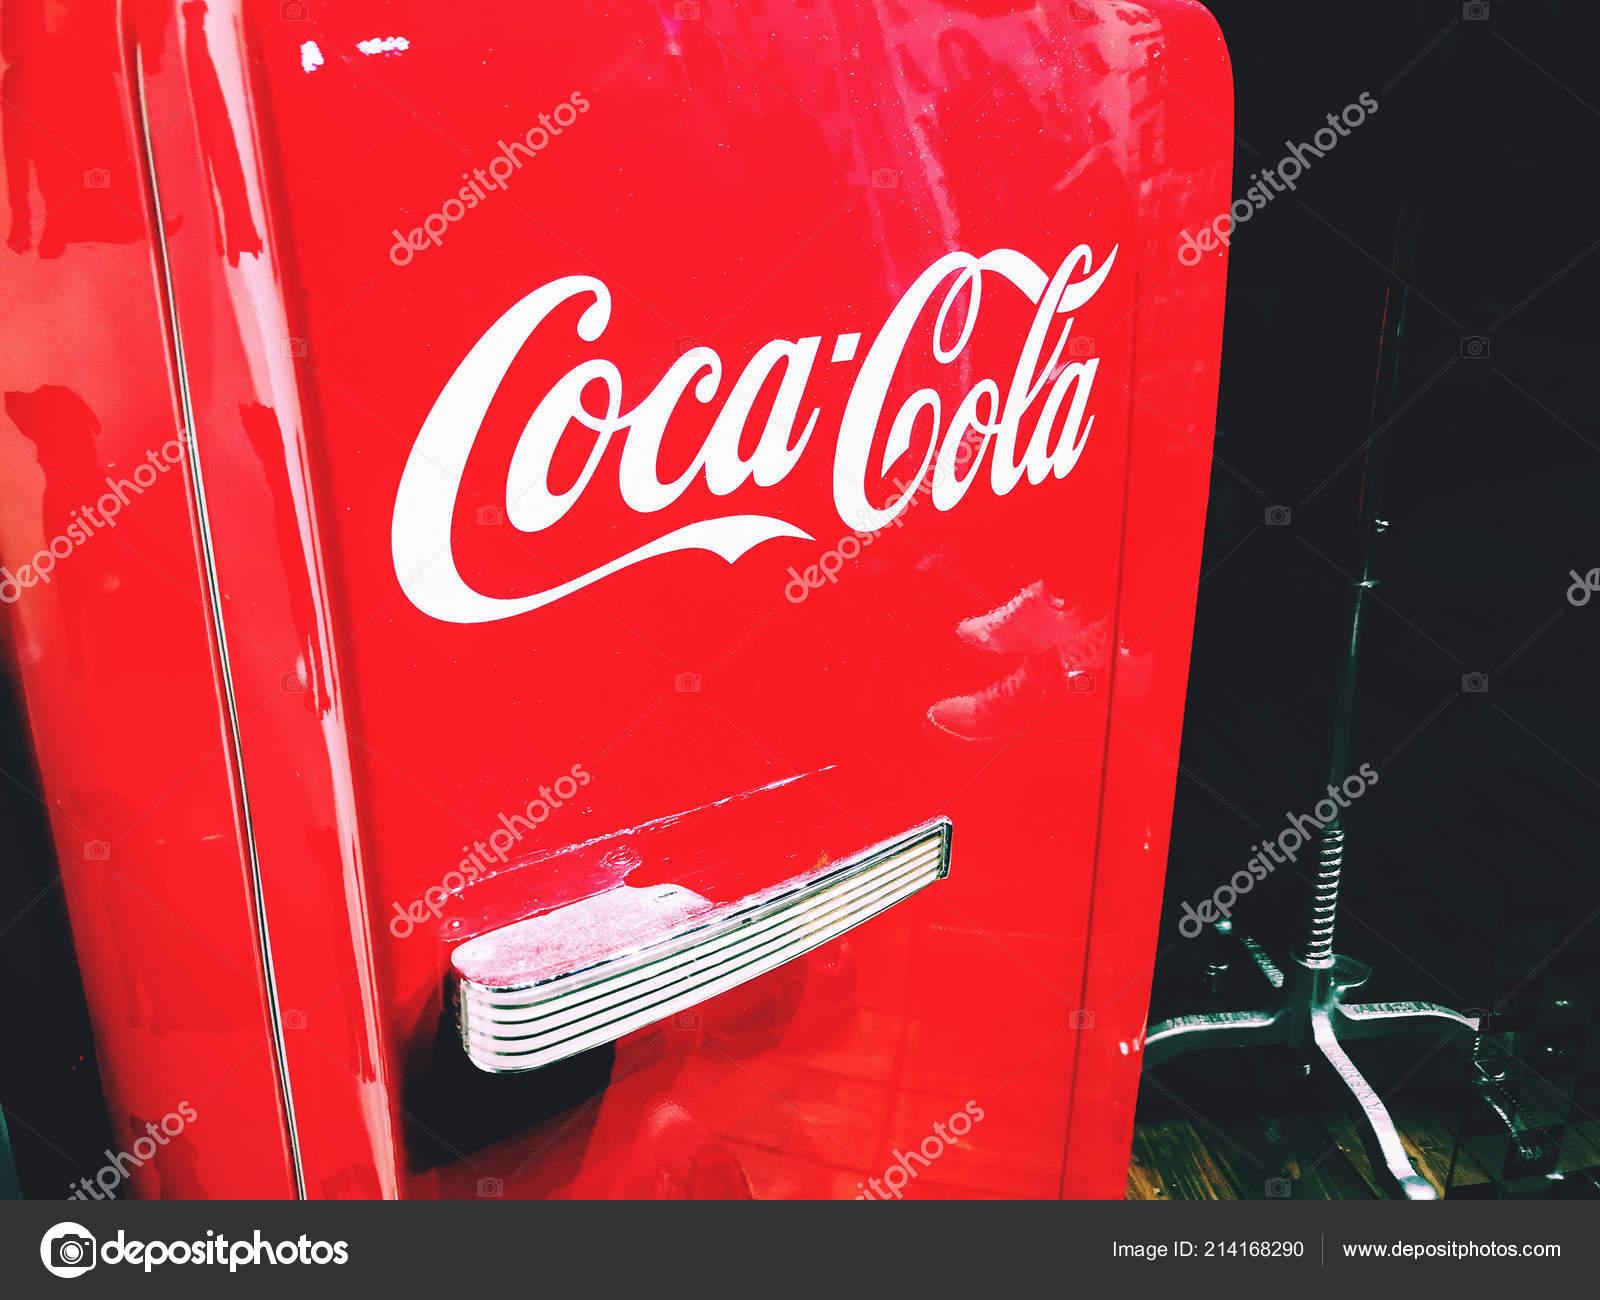 Kühlschrank Coca Cola : Coca cola kühlschrank mieten preiswerter kühlschrank verleih